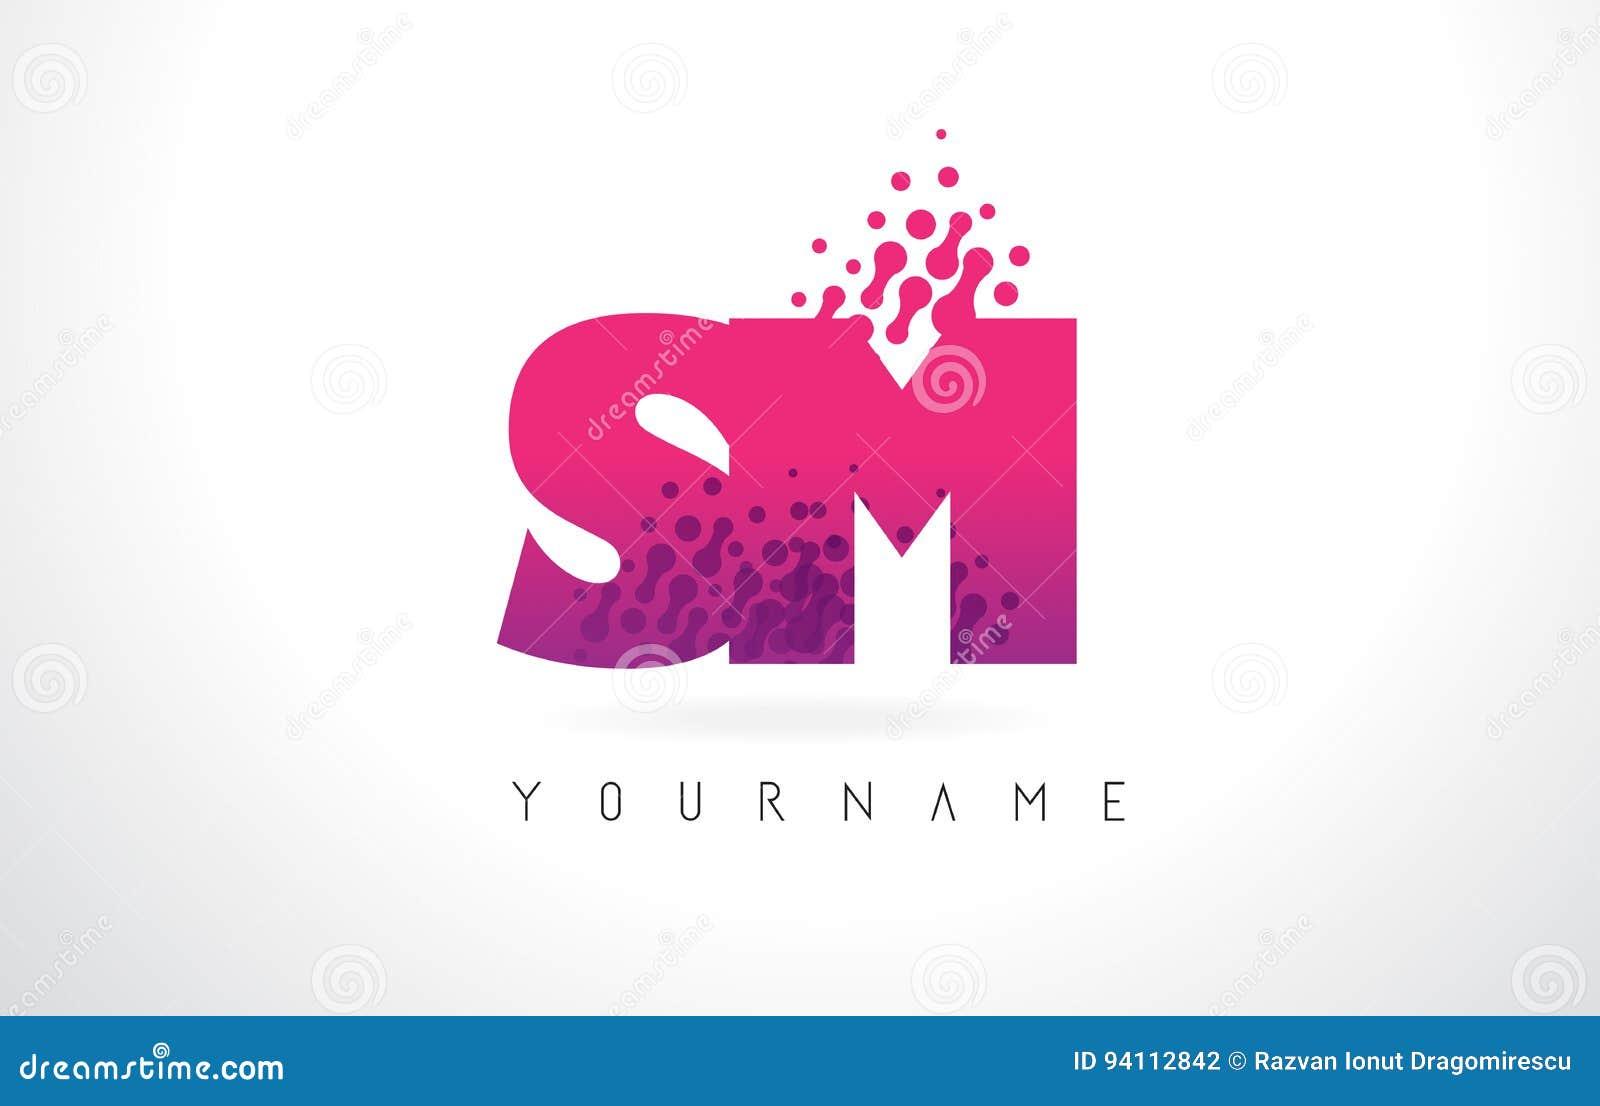 SM S M Letter Logo With Pink Purple Color And Particles Dots Des ...